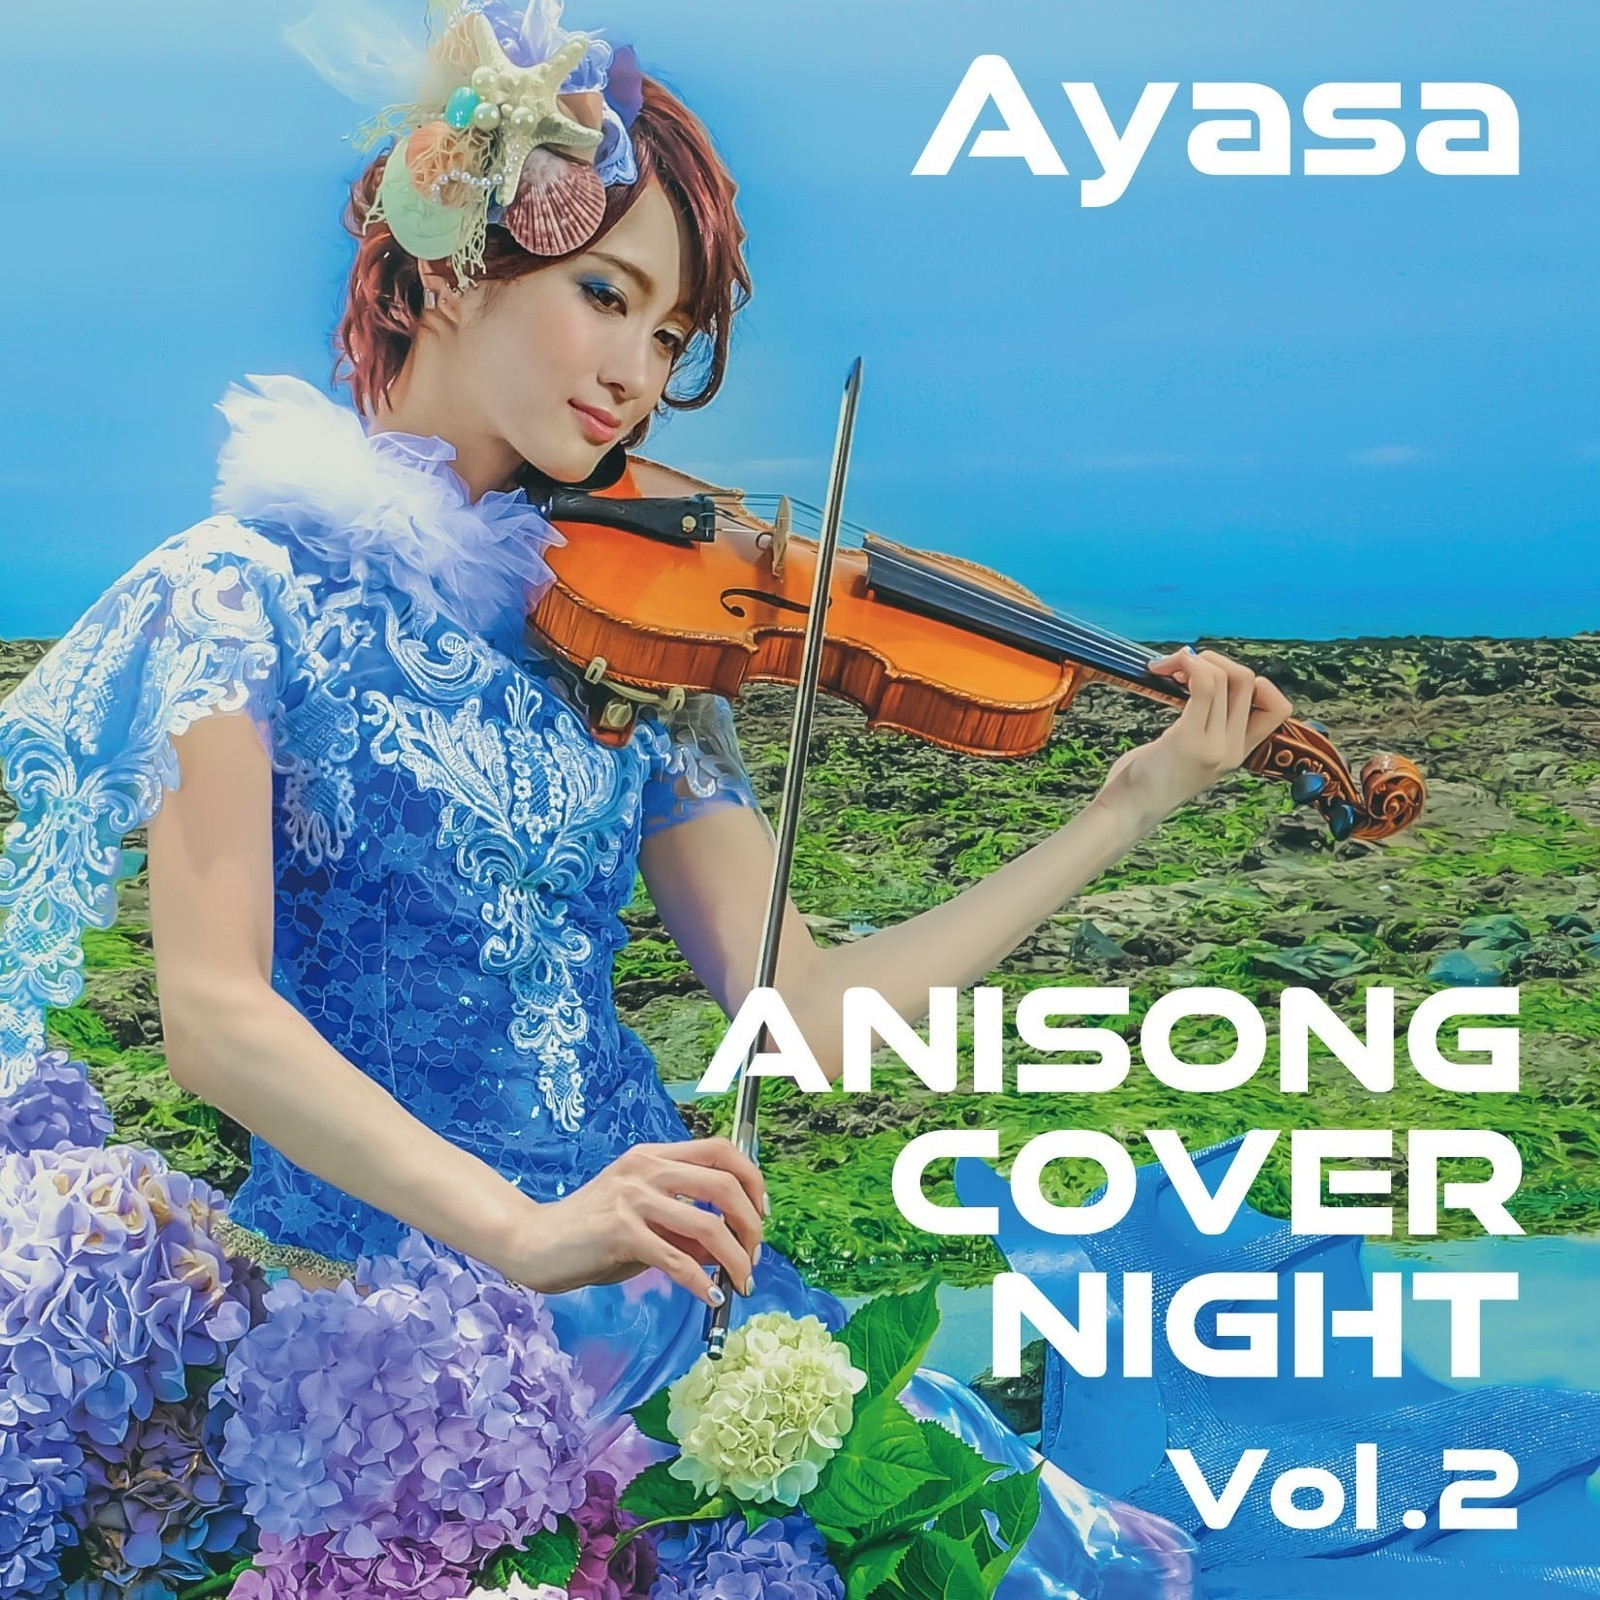 Download Ayasa - ANISON COVER NIGHT Vol.2 Album